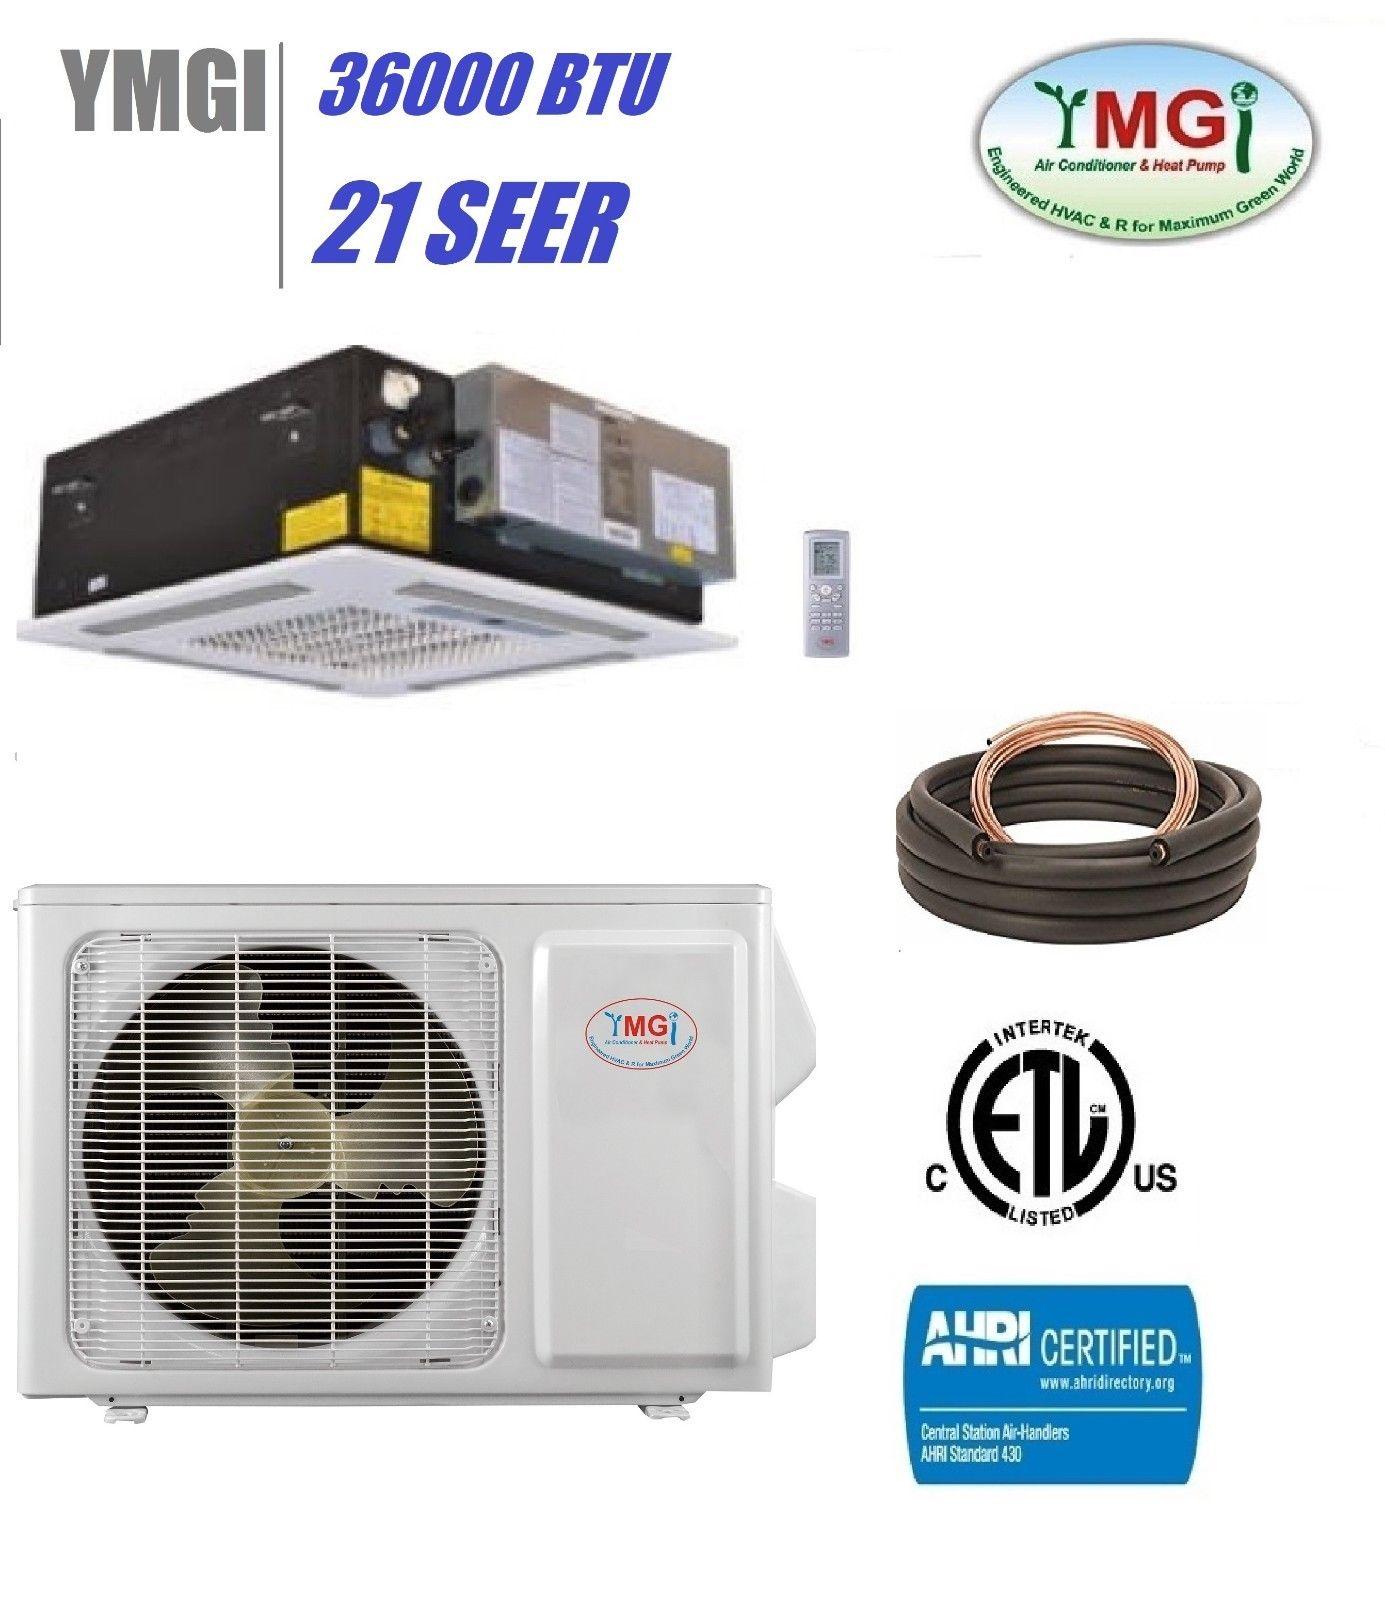 Ymgi 36000 Btu 21 Seer Ductless Mini Split Air Conditioner Heat